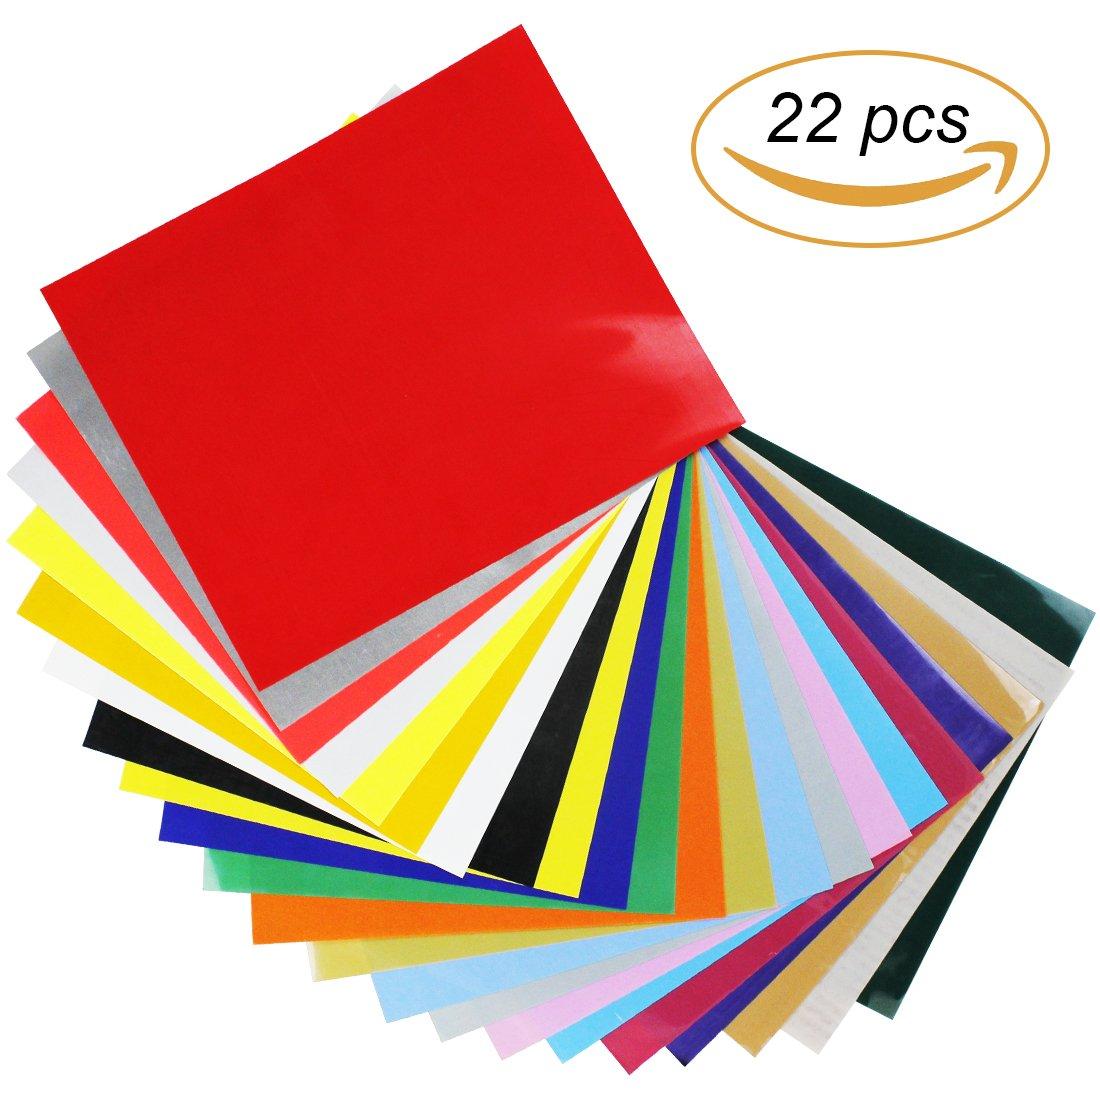 Pantipinky HTV Heat Transfer Vinyl Bundle 12x10-22 Pack of Assorted Colors Best HTV Vinyl for Silhouette Cameo, Cricut, Heat Press - Bonus Teflon Sheet Iron On vinyl for DIY T-shirts by Pantipinky